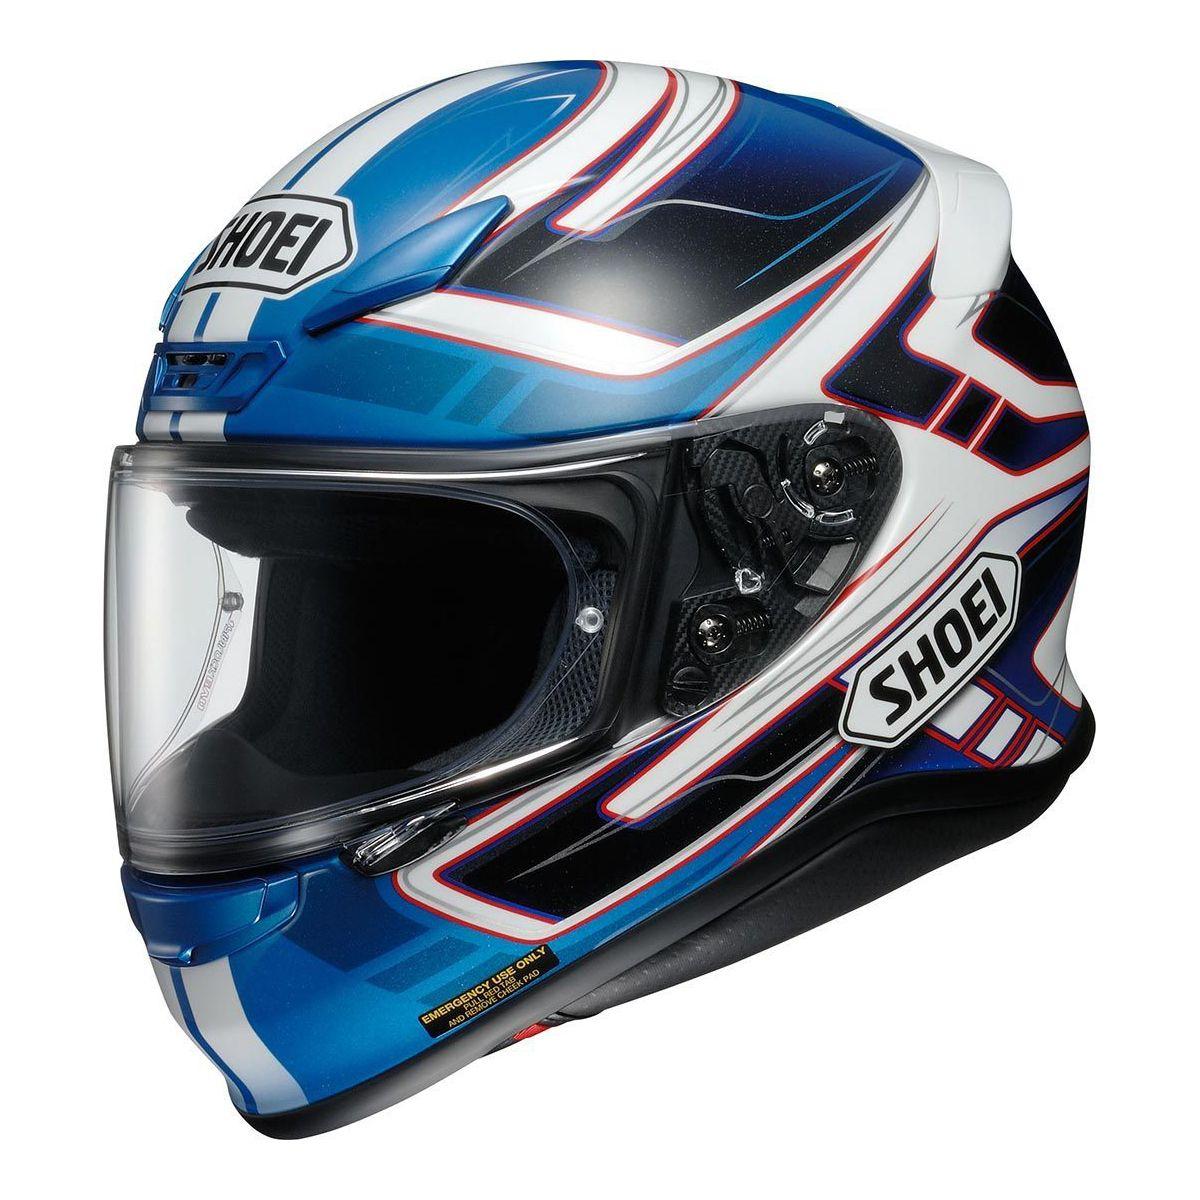 Shoei RF-1000 Helmet Review